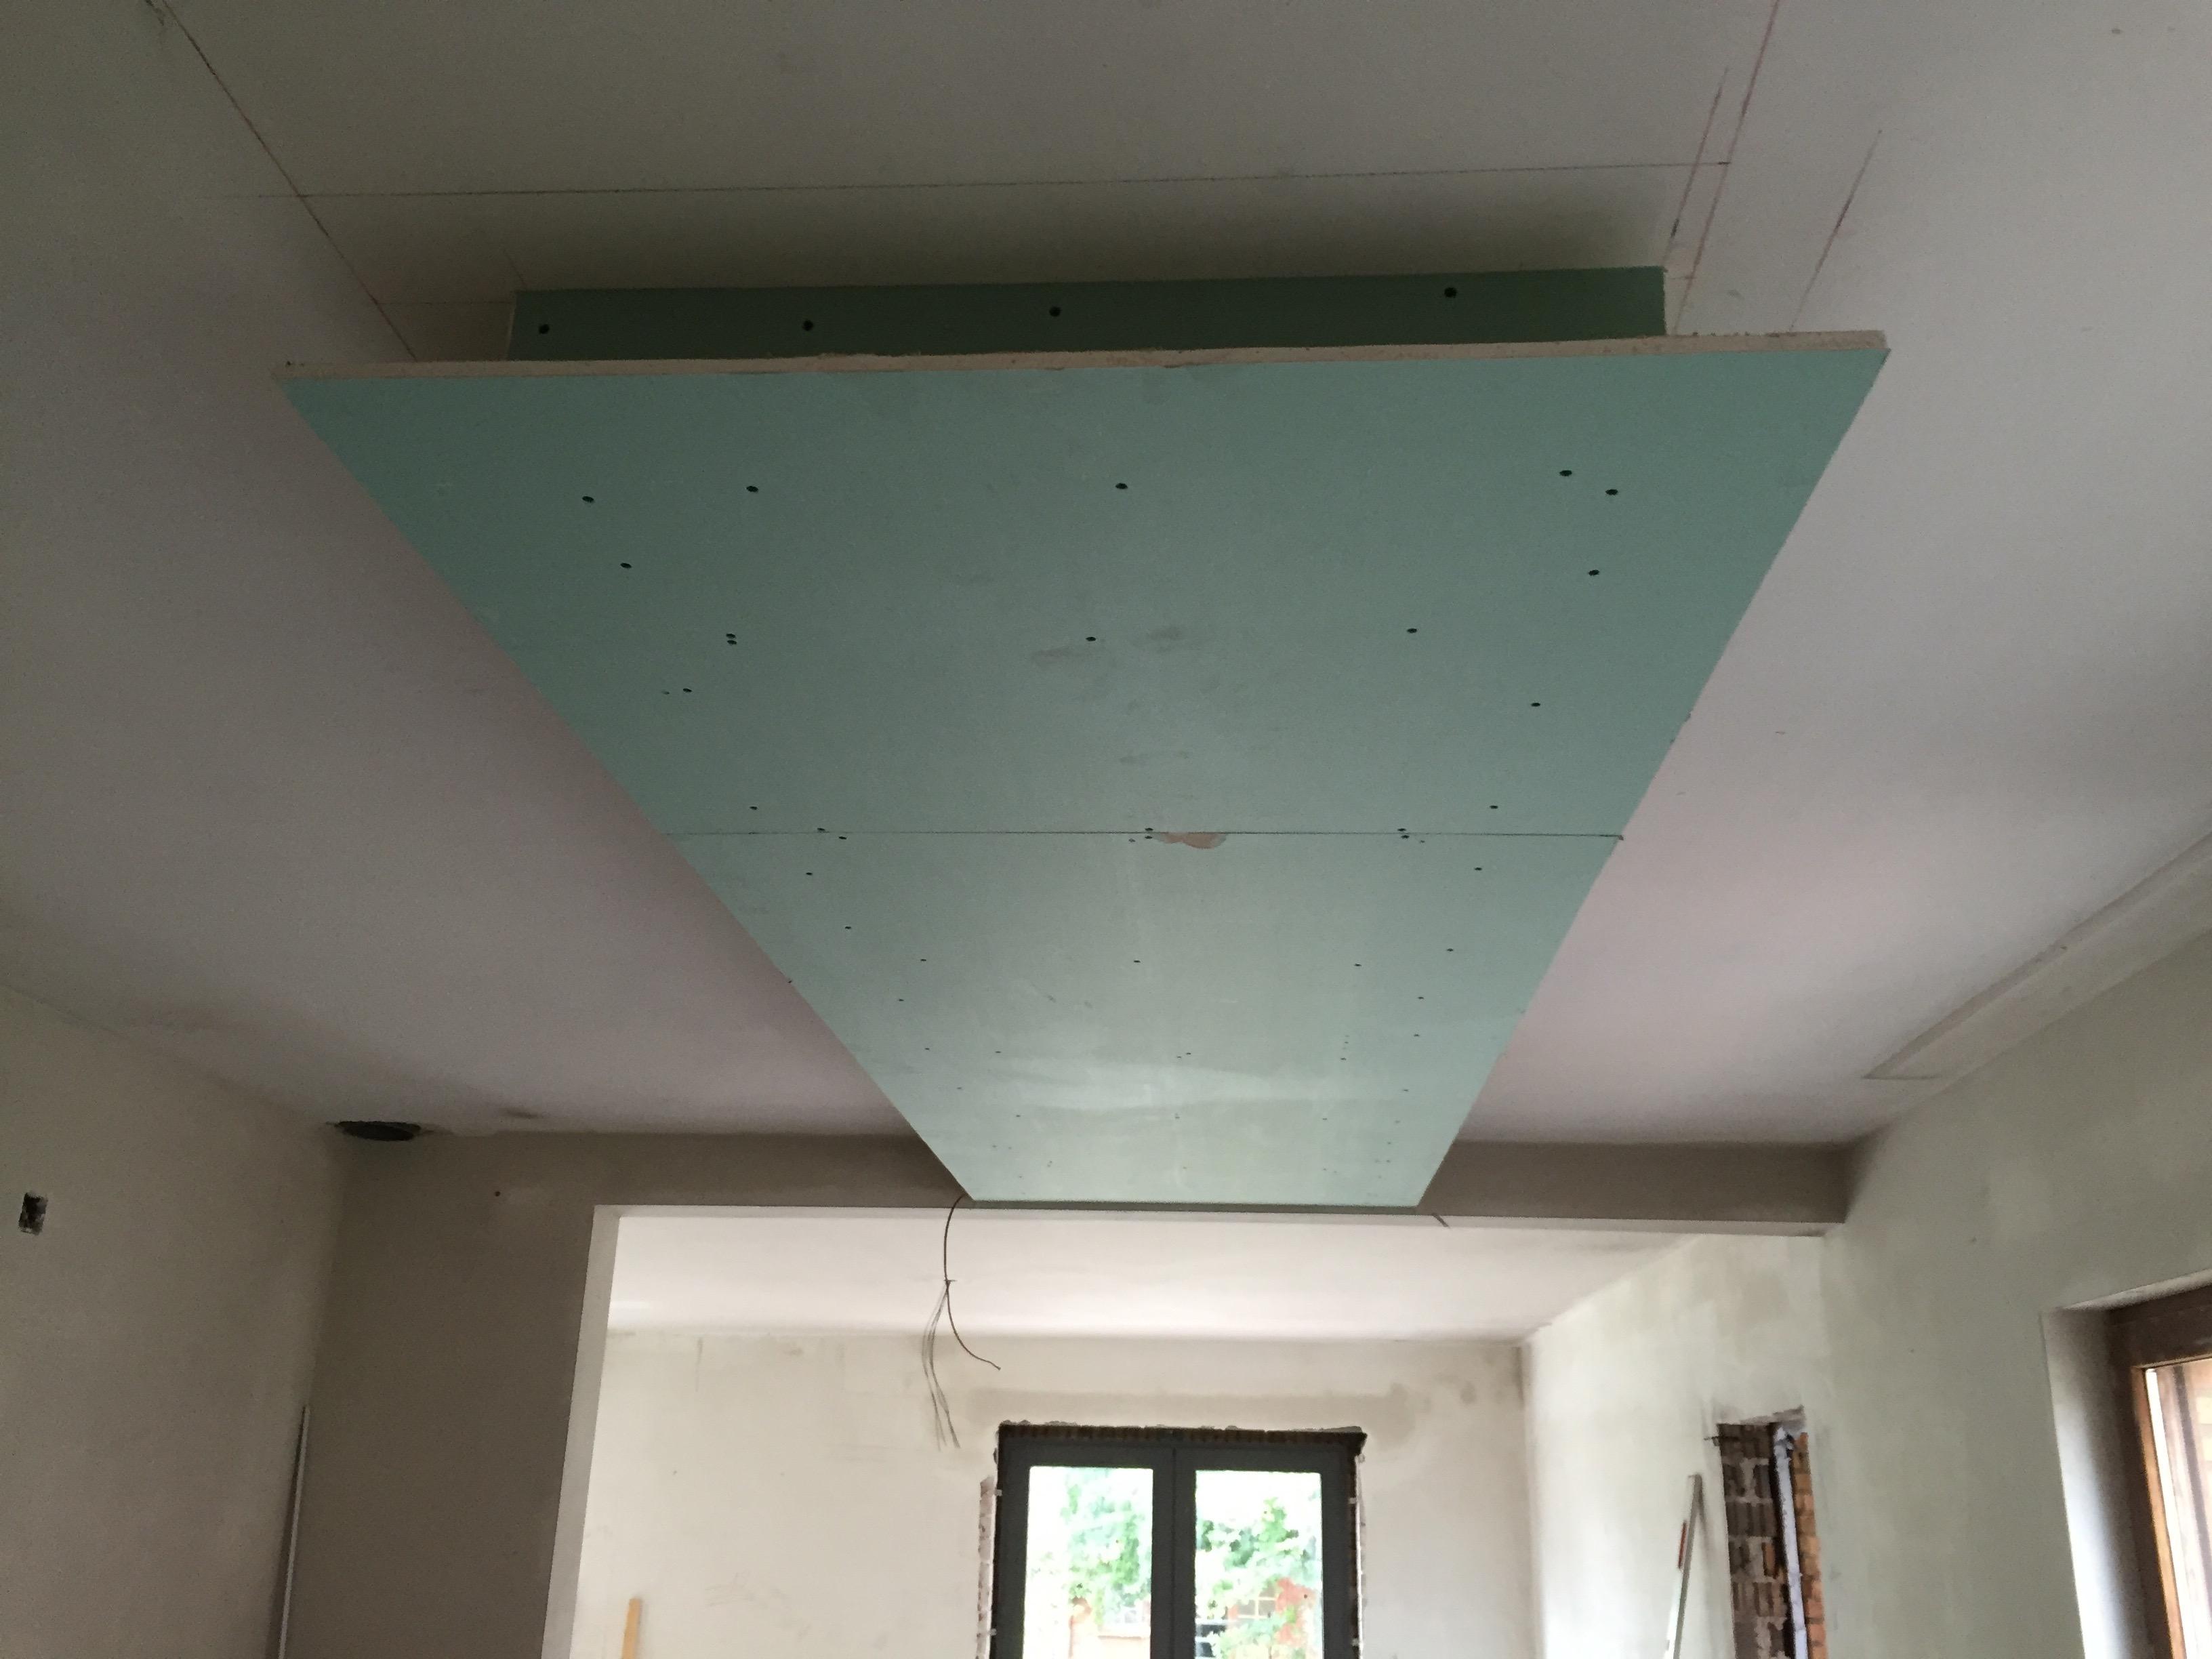 Gyprocplafond keuken